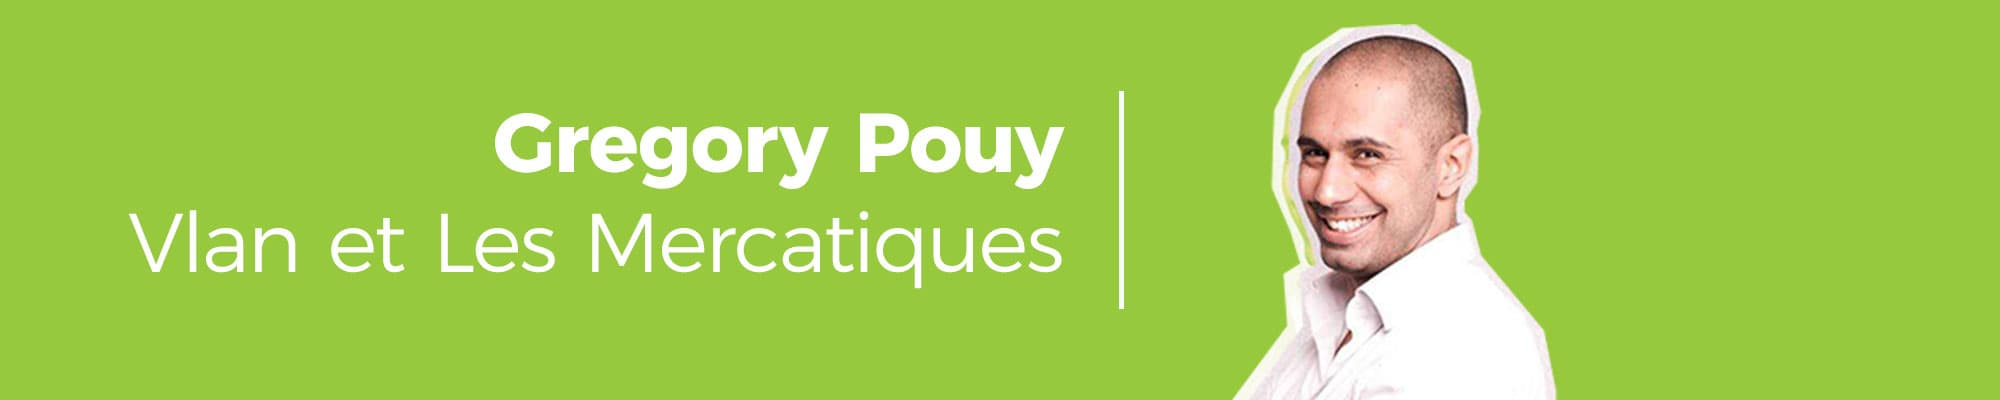 Gregory Pouy entrepreneur inspirant fondateur du podcast Vlan